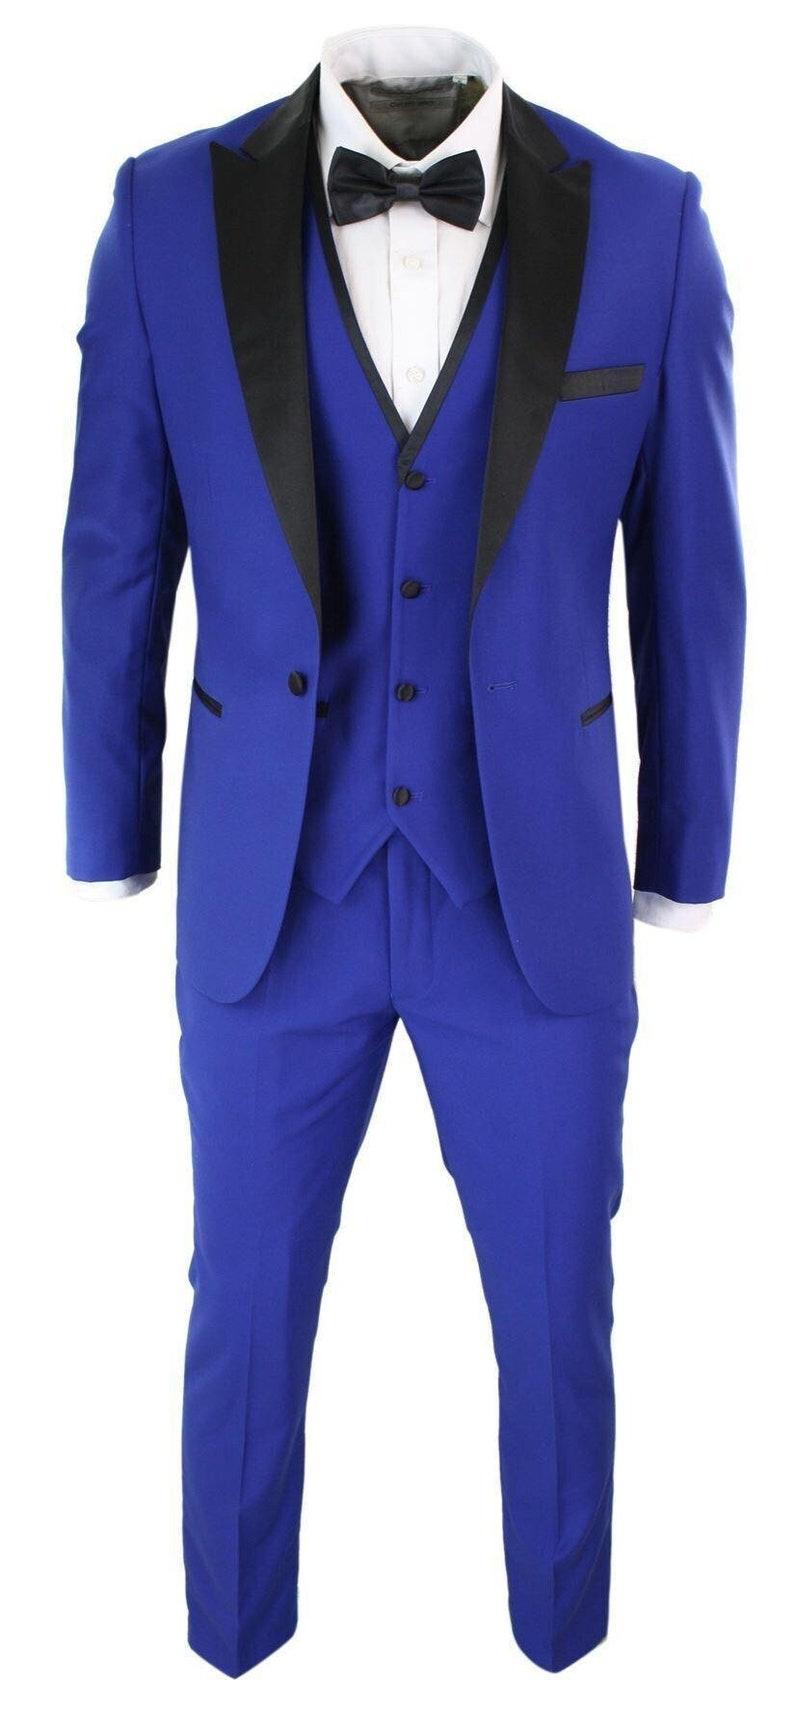 1960s Mens Suits | Mod, Skinny, Nehru     Mens 3 piece blue black satin tuxedo dinner suit tailored fit wedding prom groom $230.83 AT vintagedancer.com